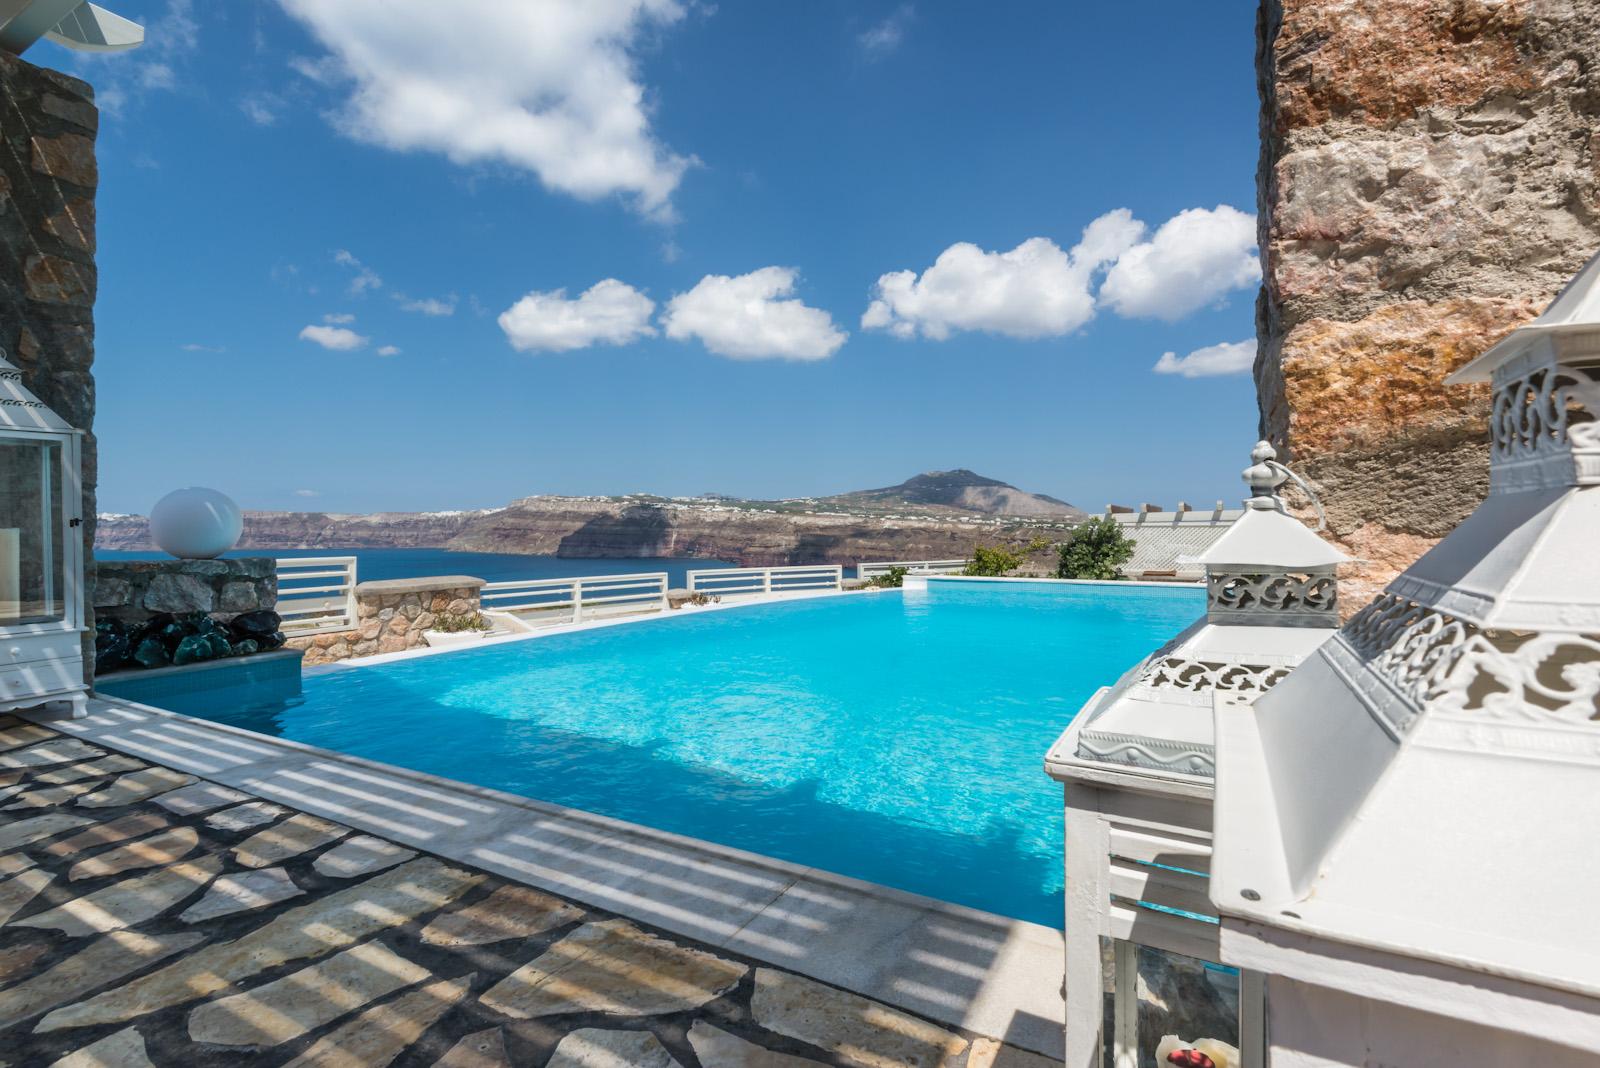 santorini villas 5 bedrooms private pool